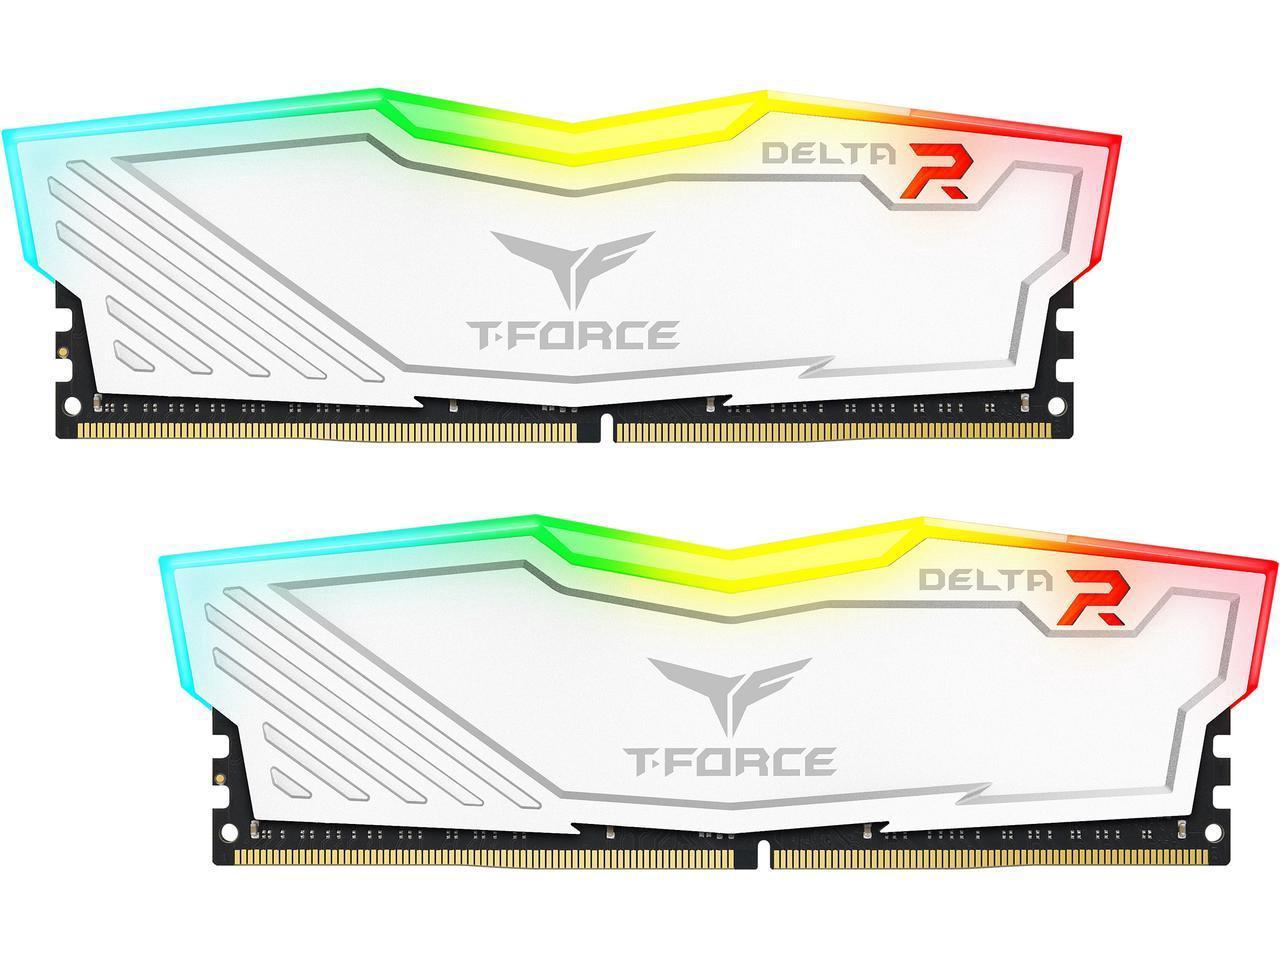 Kit Mémoire Team T-Force Delta II RGB Series 16Go (2 x 8Go) - 288-Pin DDR4 3000